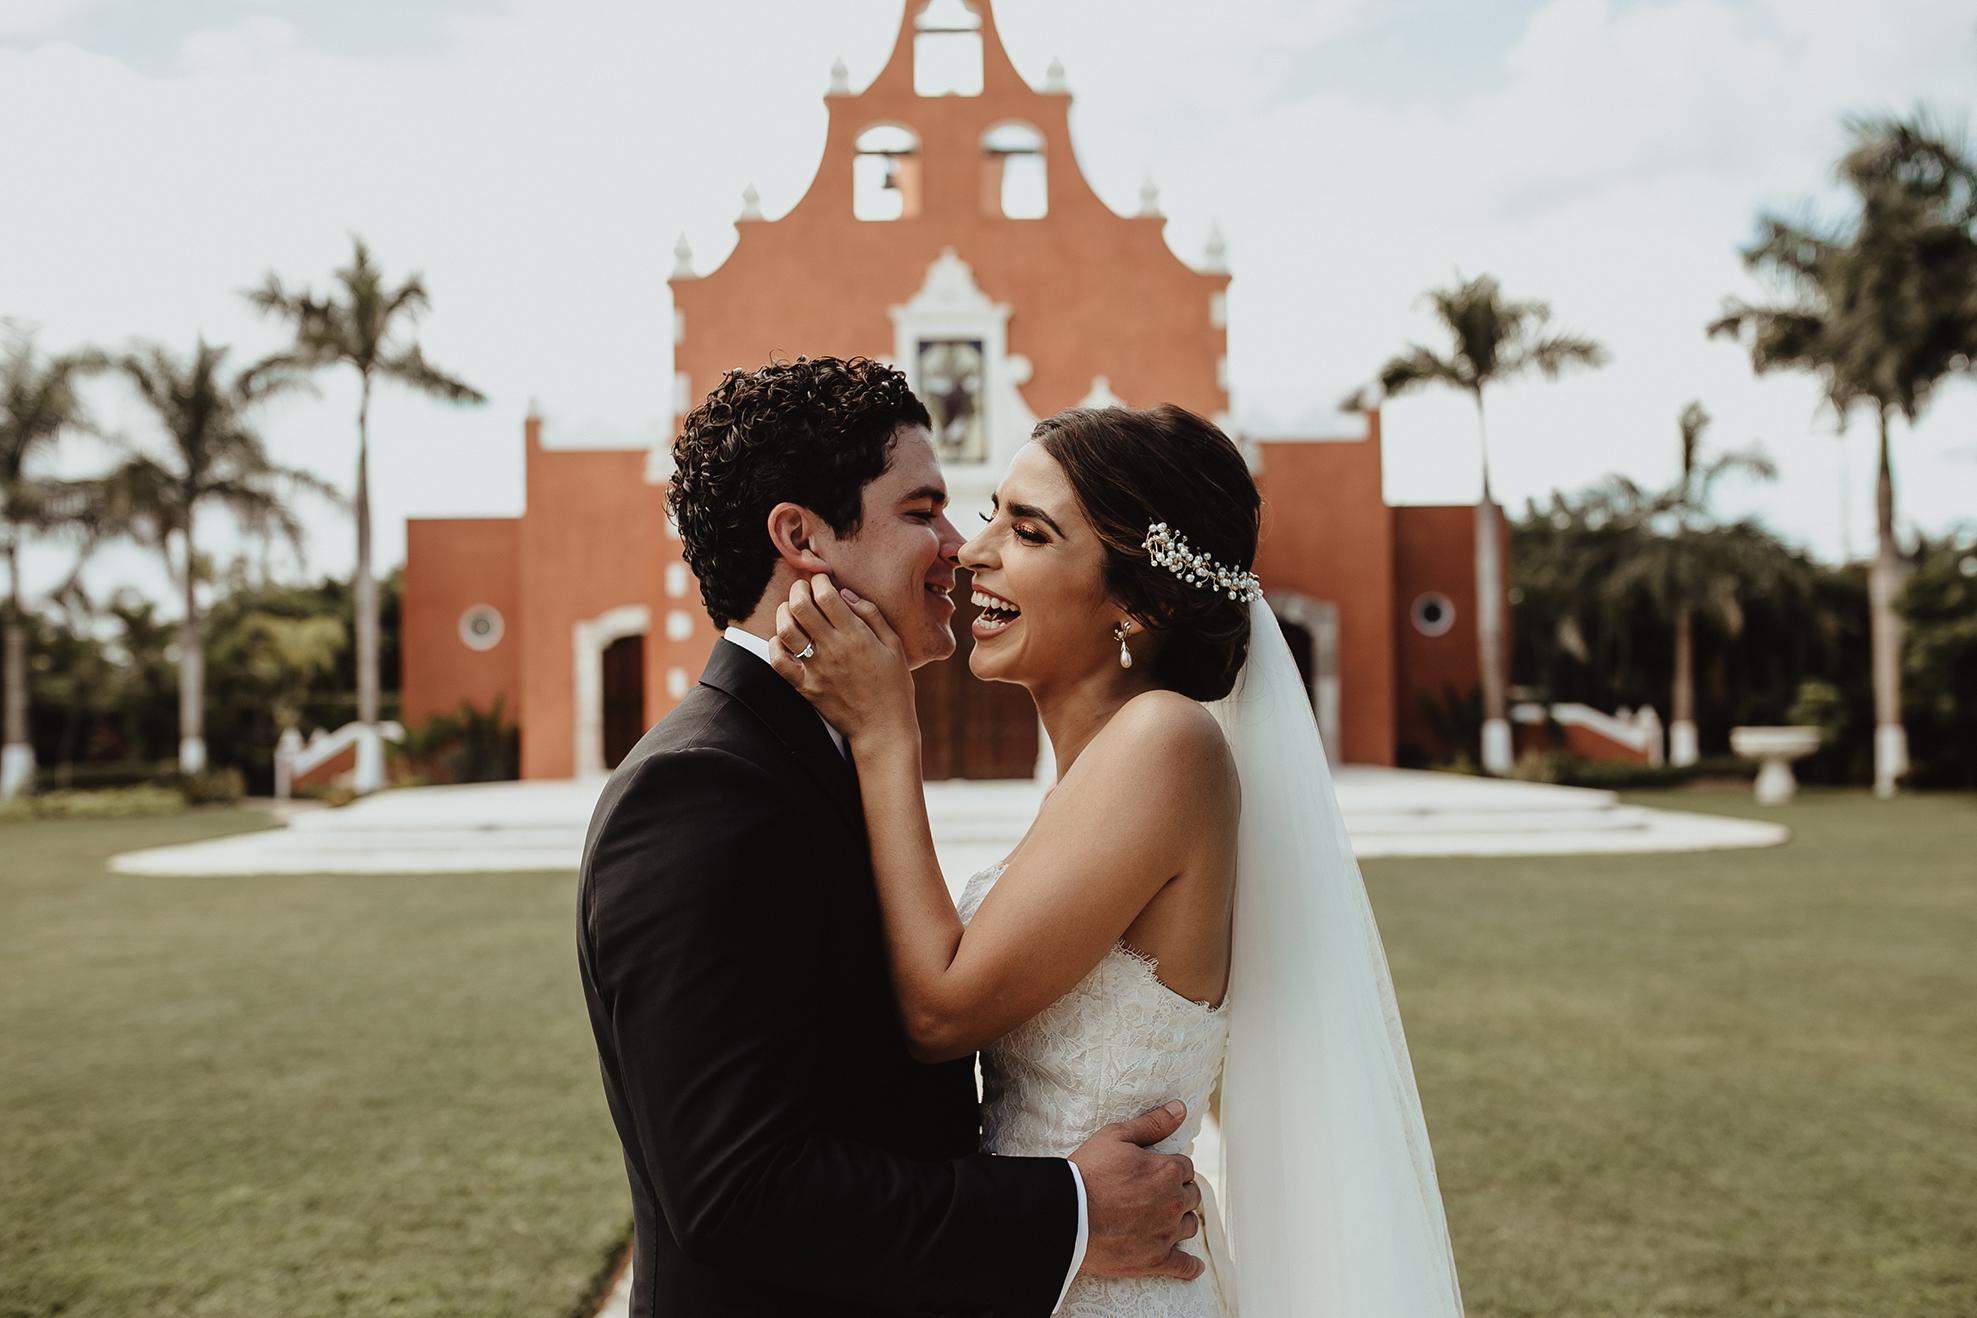 0167F&Yslide_WeddingDstination_MeridaYucatan_HaciendasMerida_BodasMexico_BodasYucatan_Boda_Destino.jpg